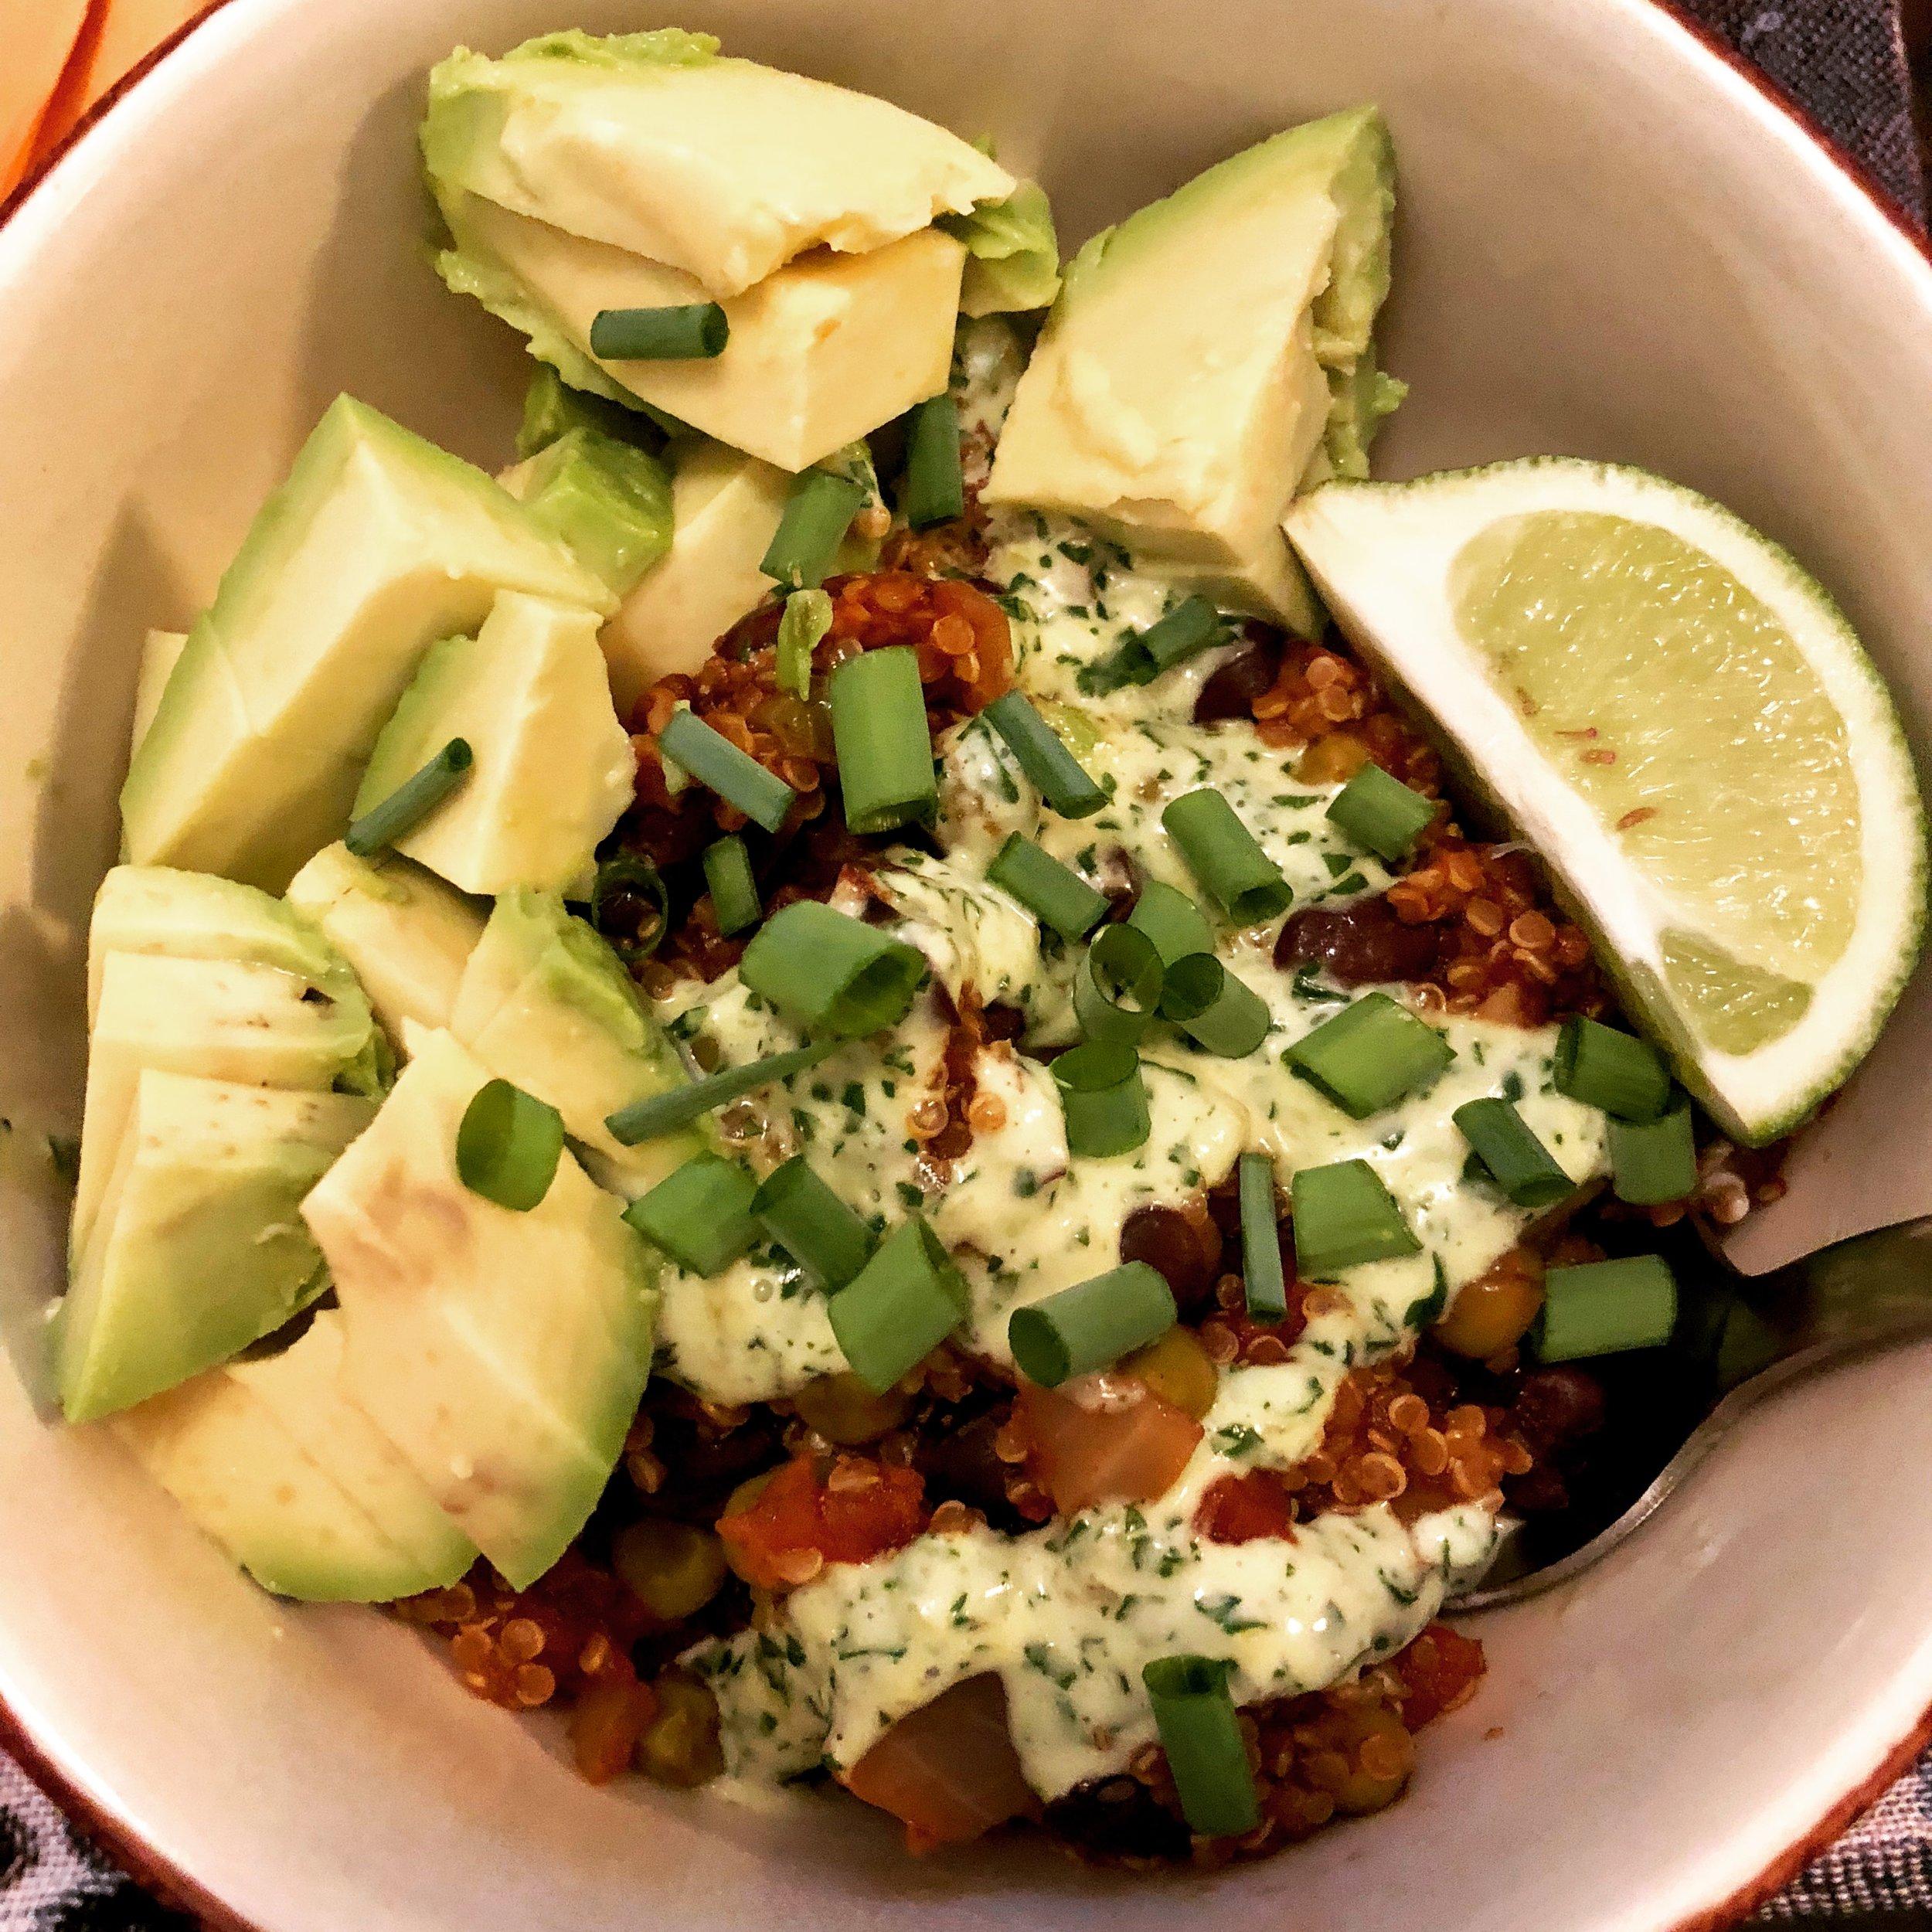 Mexican Quinoa Bowl Photo credit: Alyssa DelSoldato